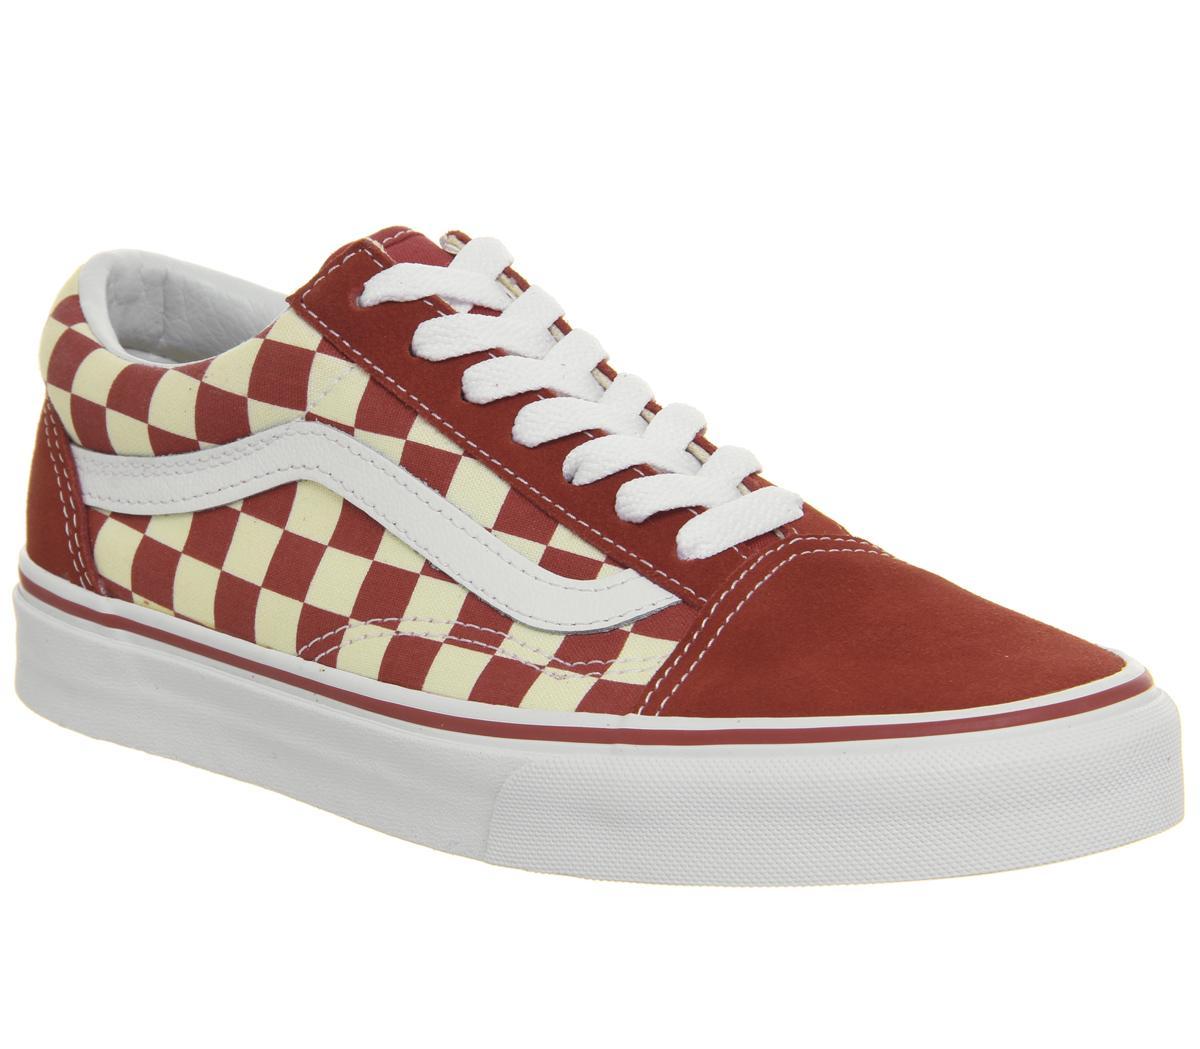 vans checkerboard old skool red and